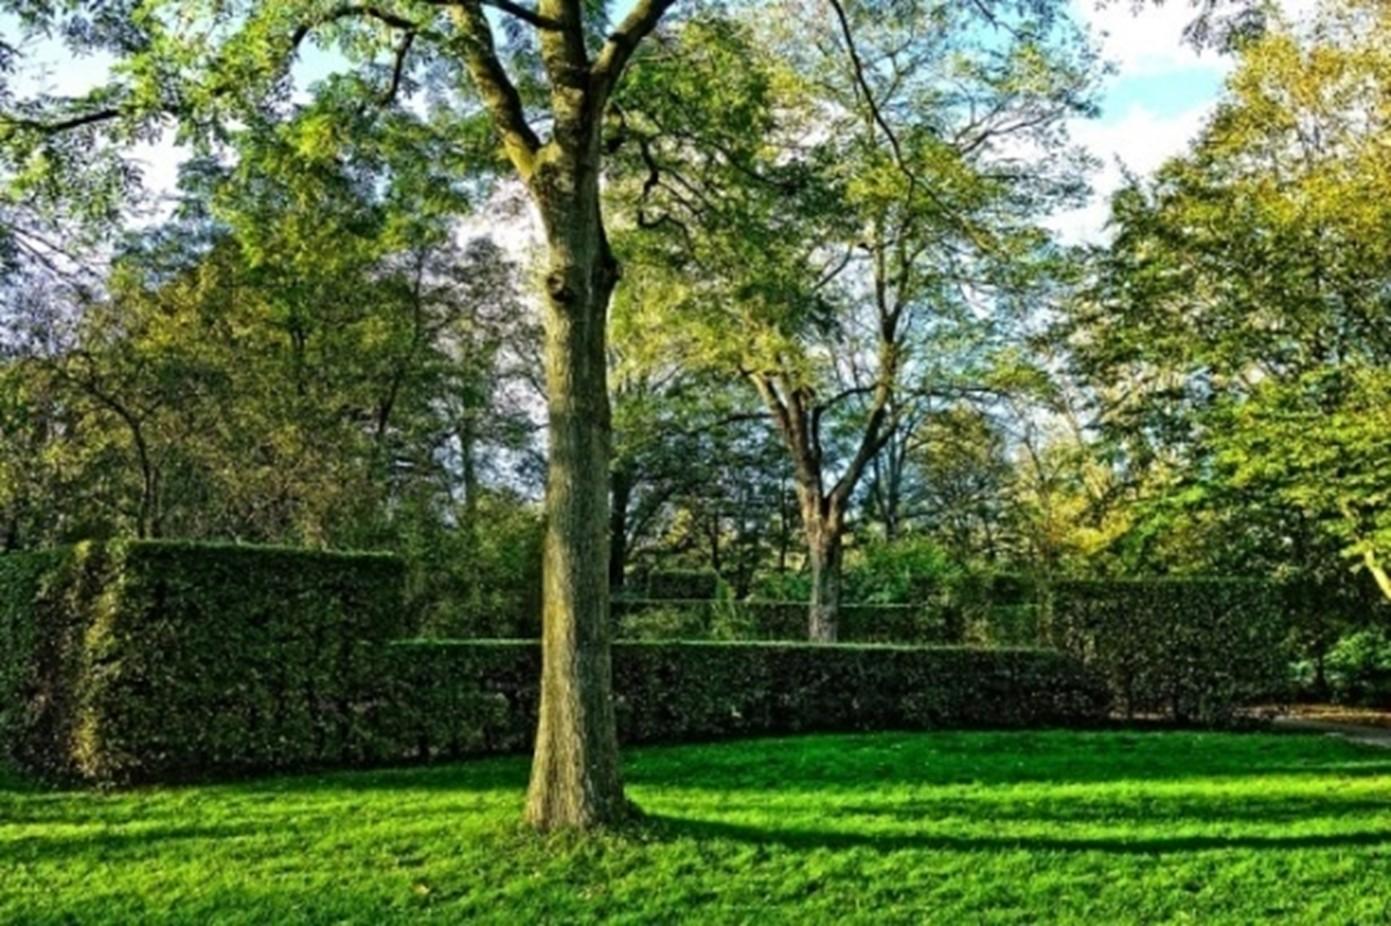 Hedged Walls